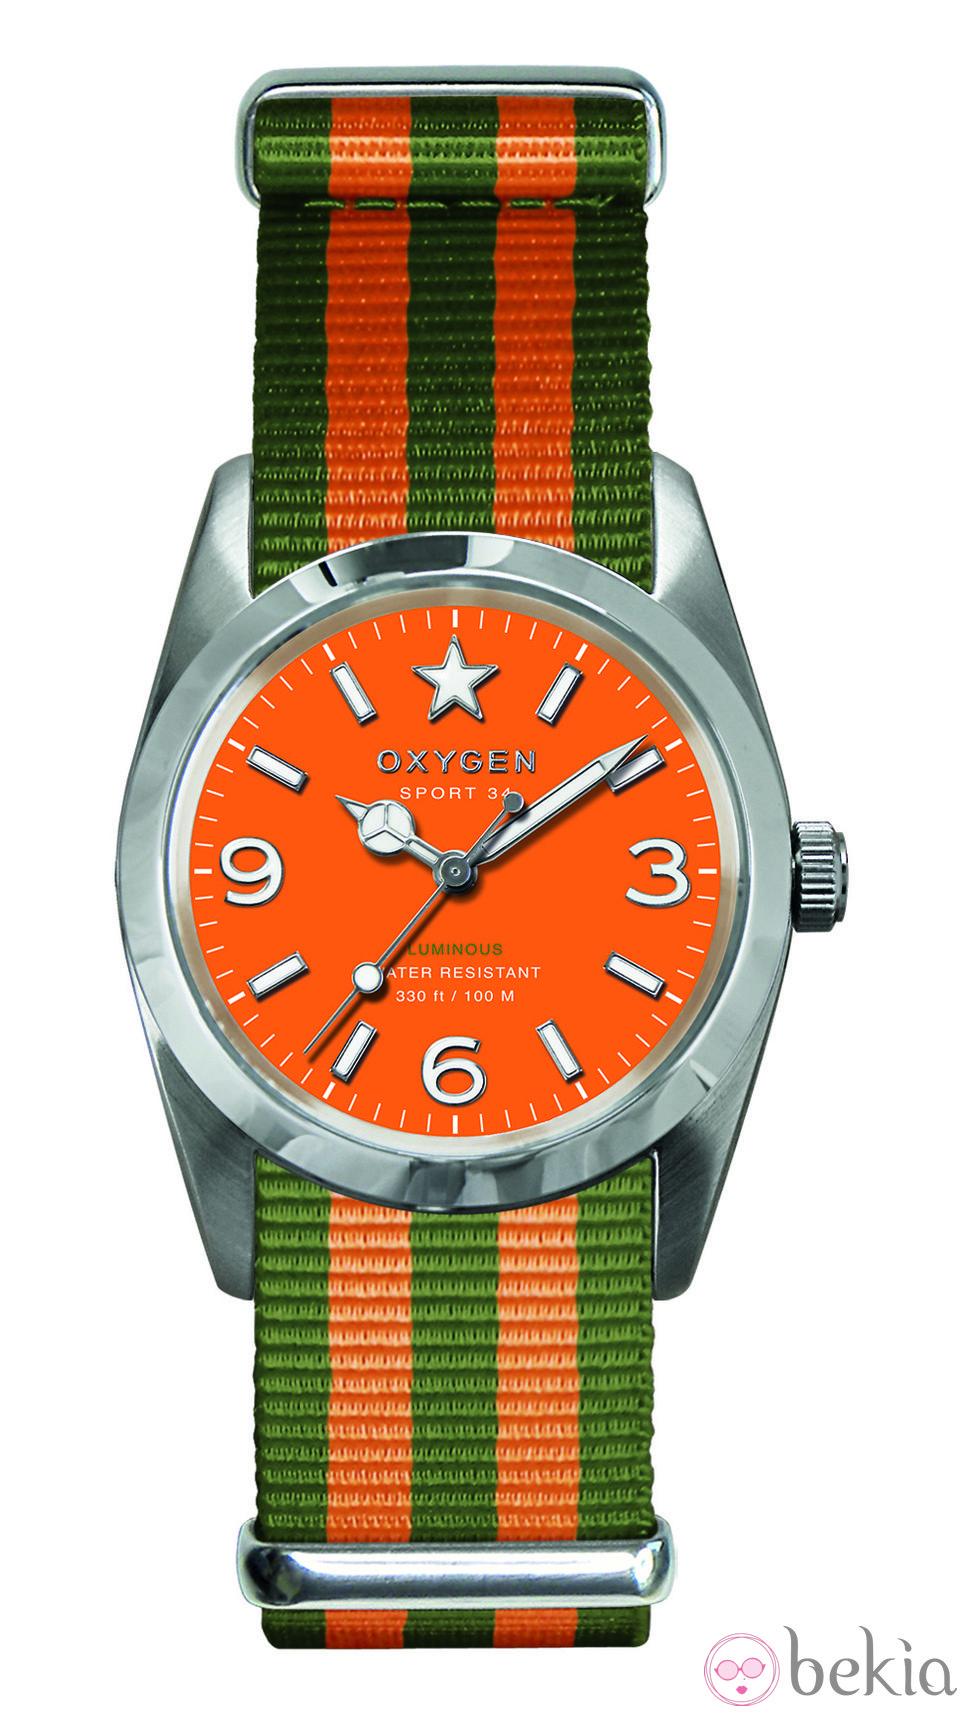 82e5142334b3 Anterior Reloj naranja modelo Sport 34 de la colección primavera verano 2013  de Oxygen